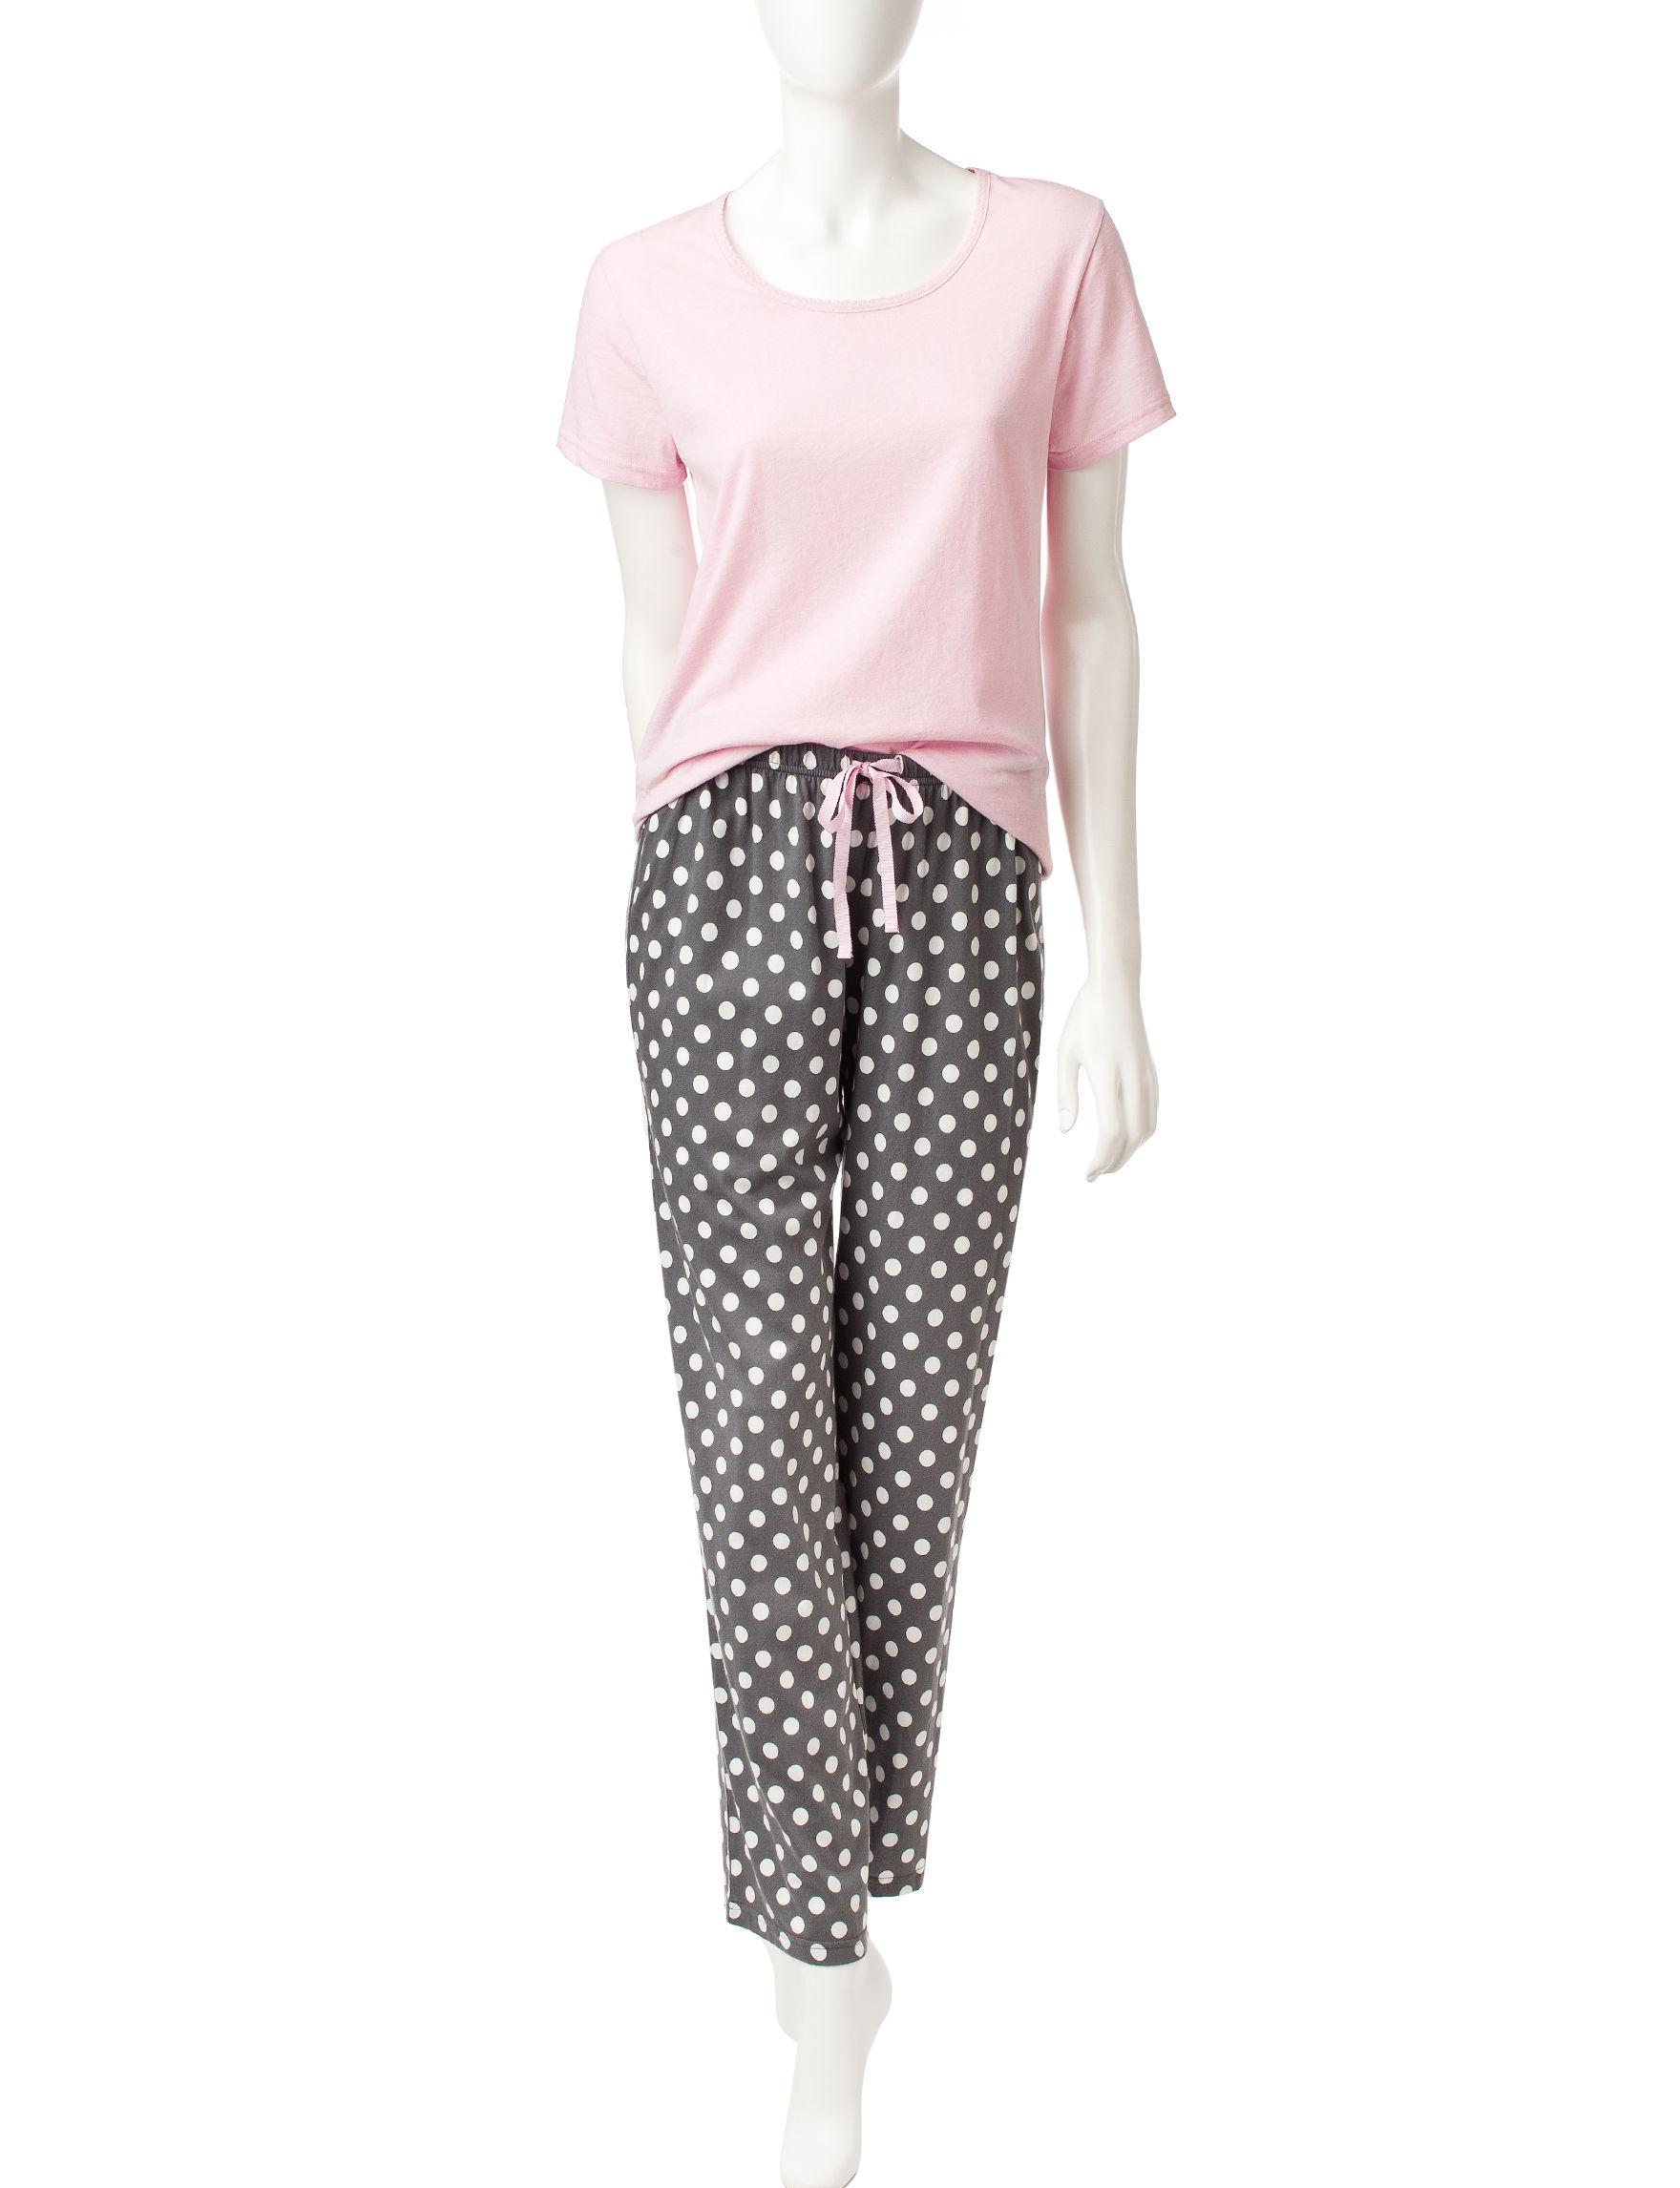 Hanes Medium Pink Pajama Sets